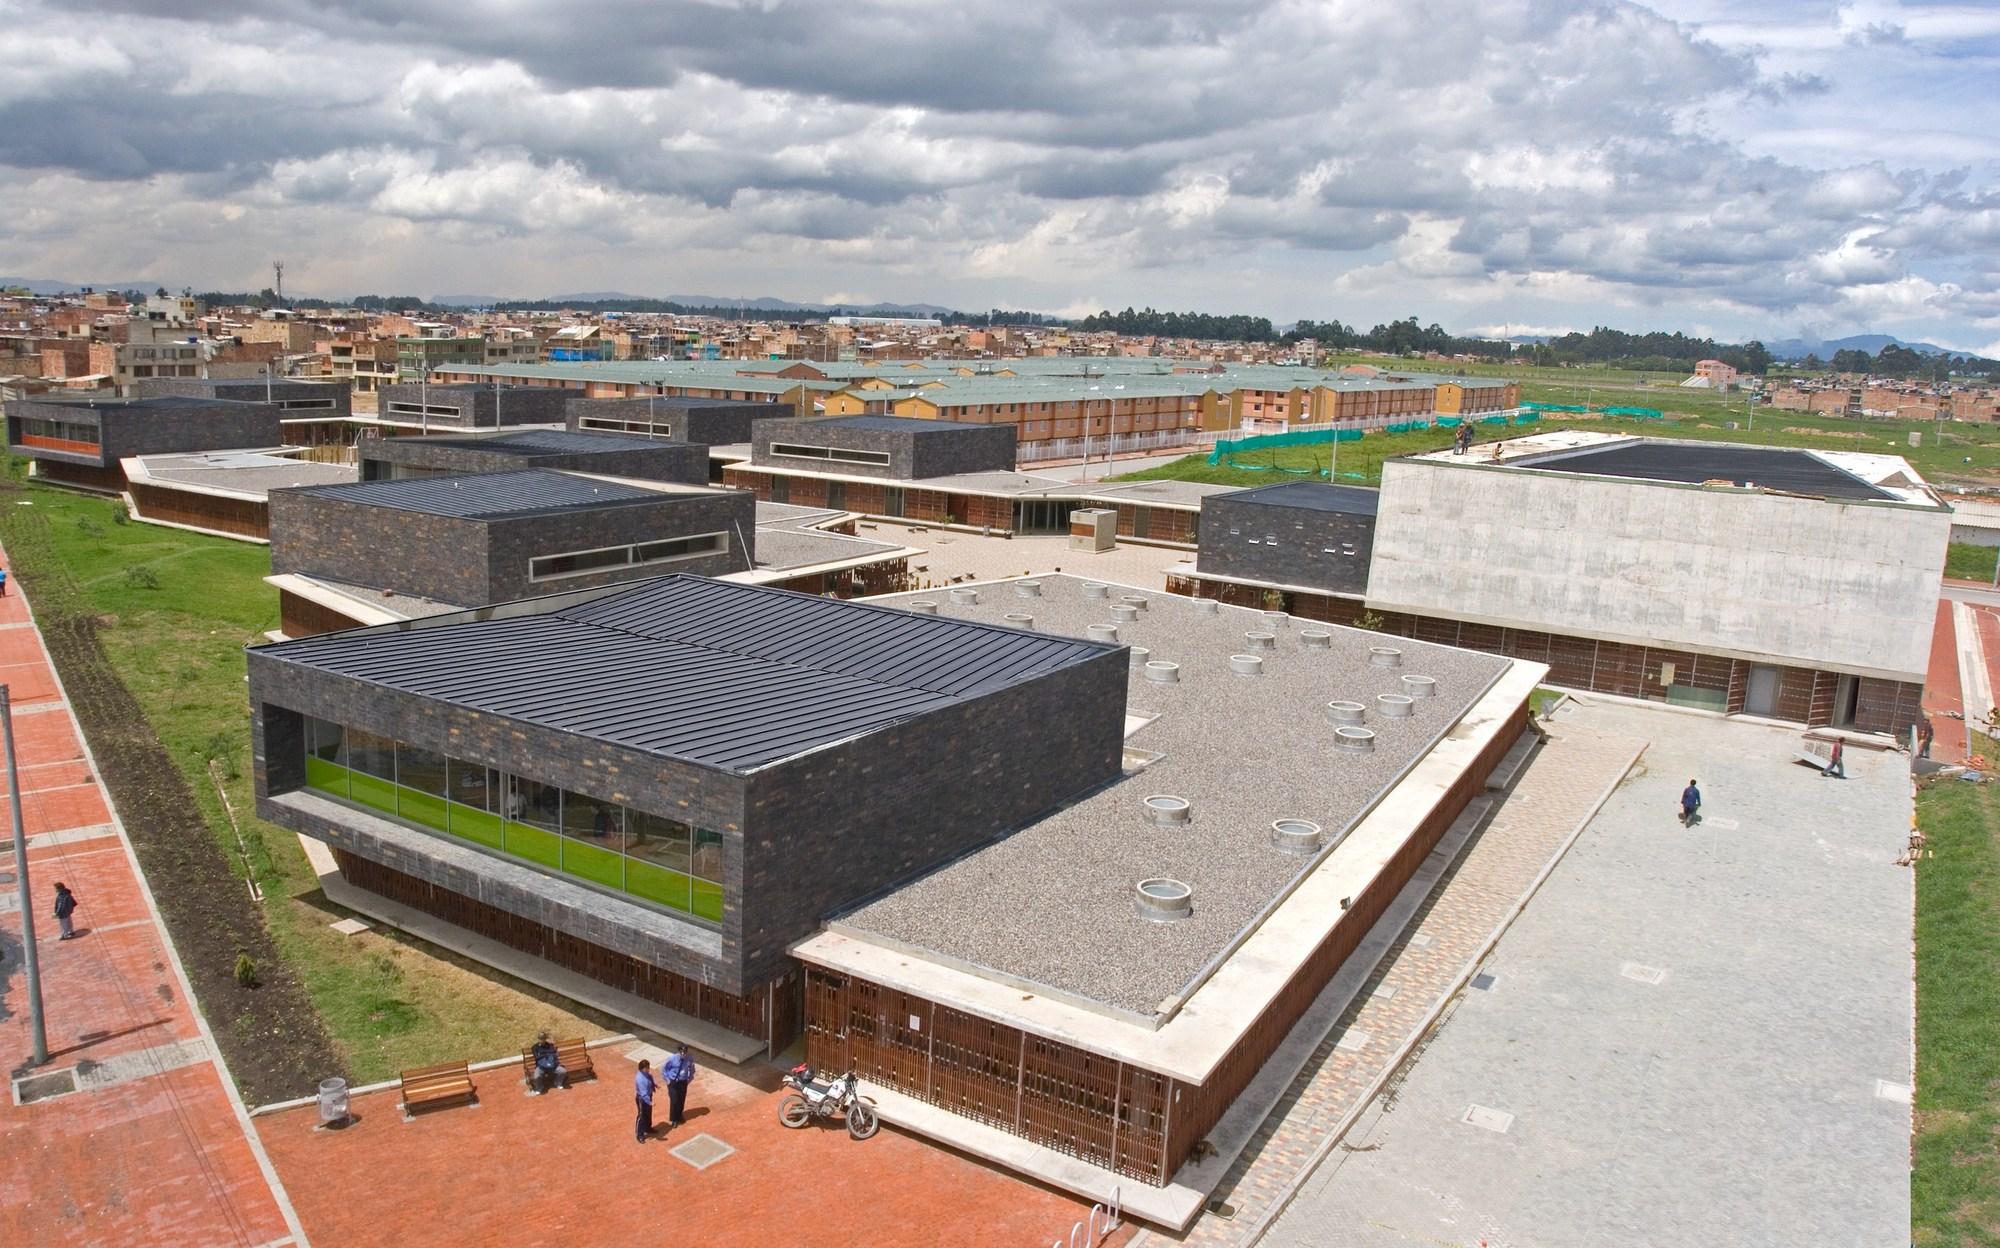 Colegio gerardo molina giancarlo mazzanti archdaily per for Plantas de colegios arquitectura